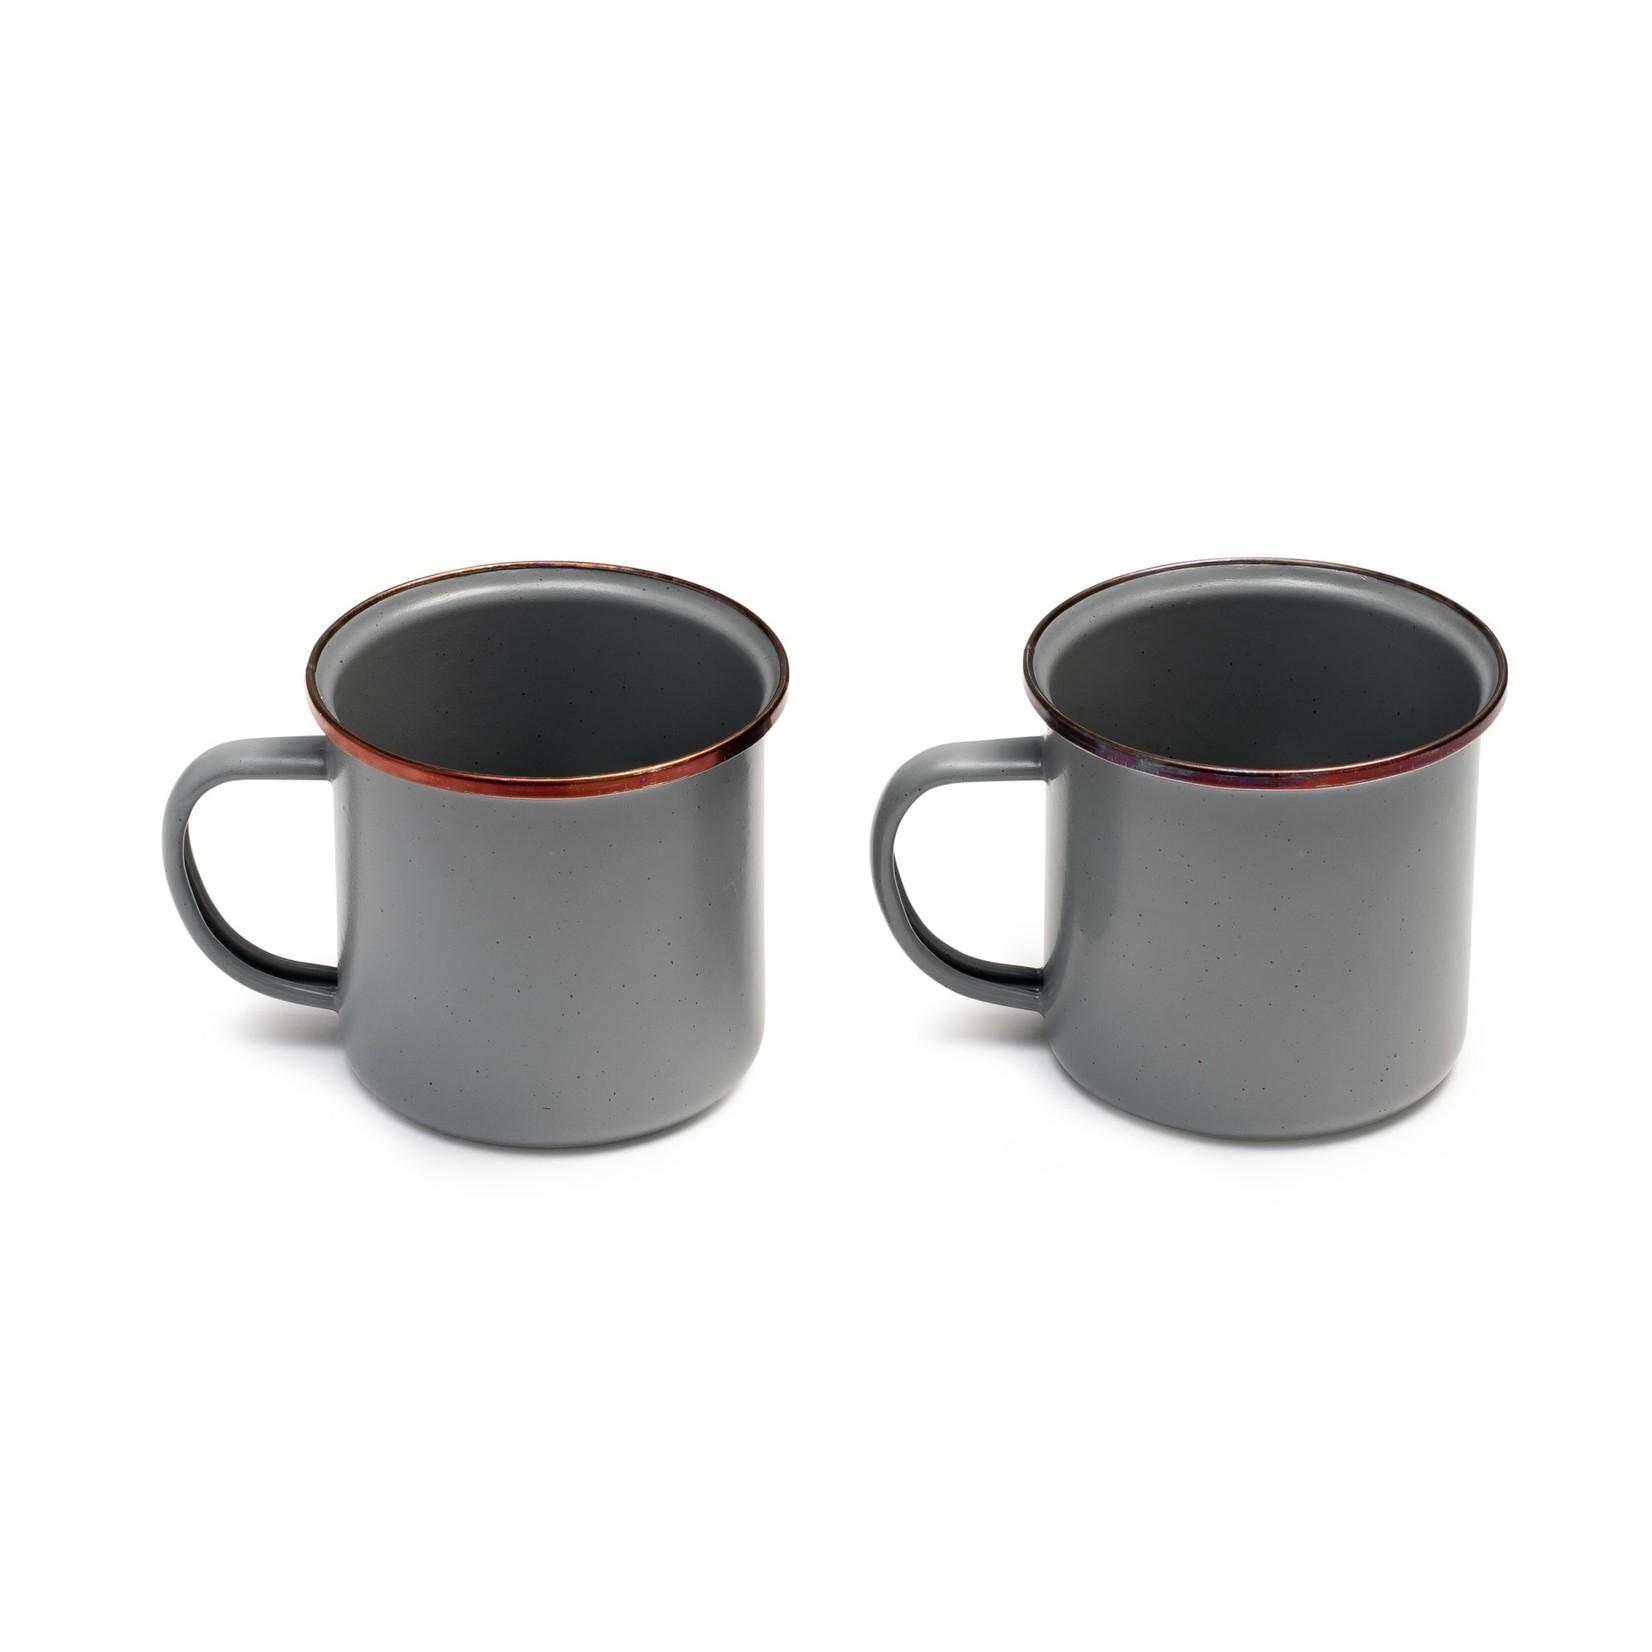 Barebones Barebones Enamel Coffee Cup Set of 2